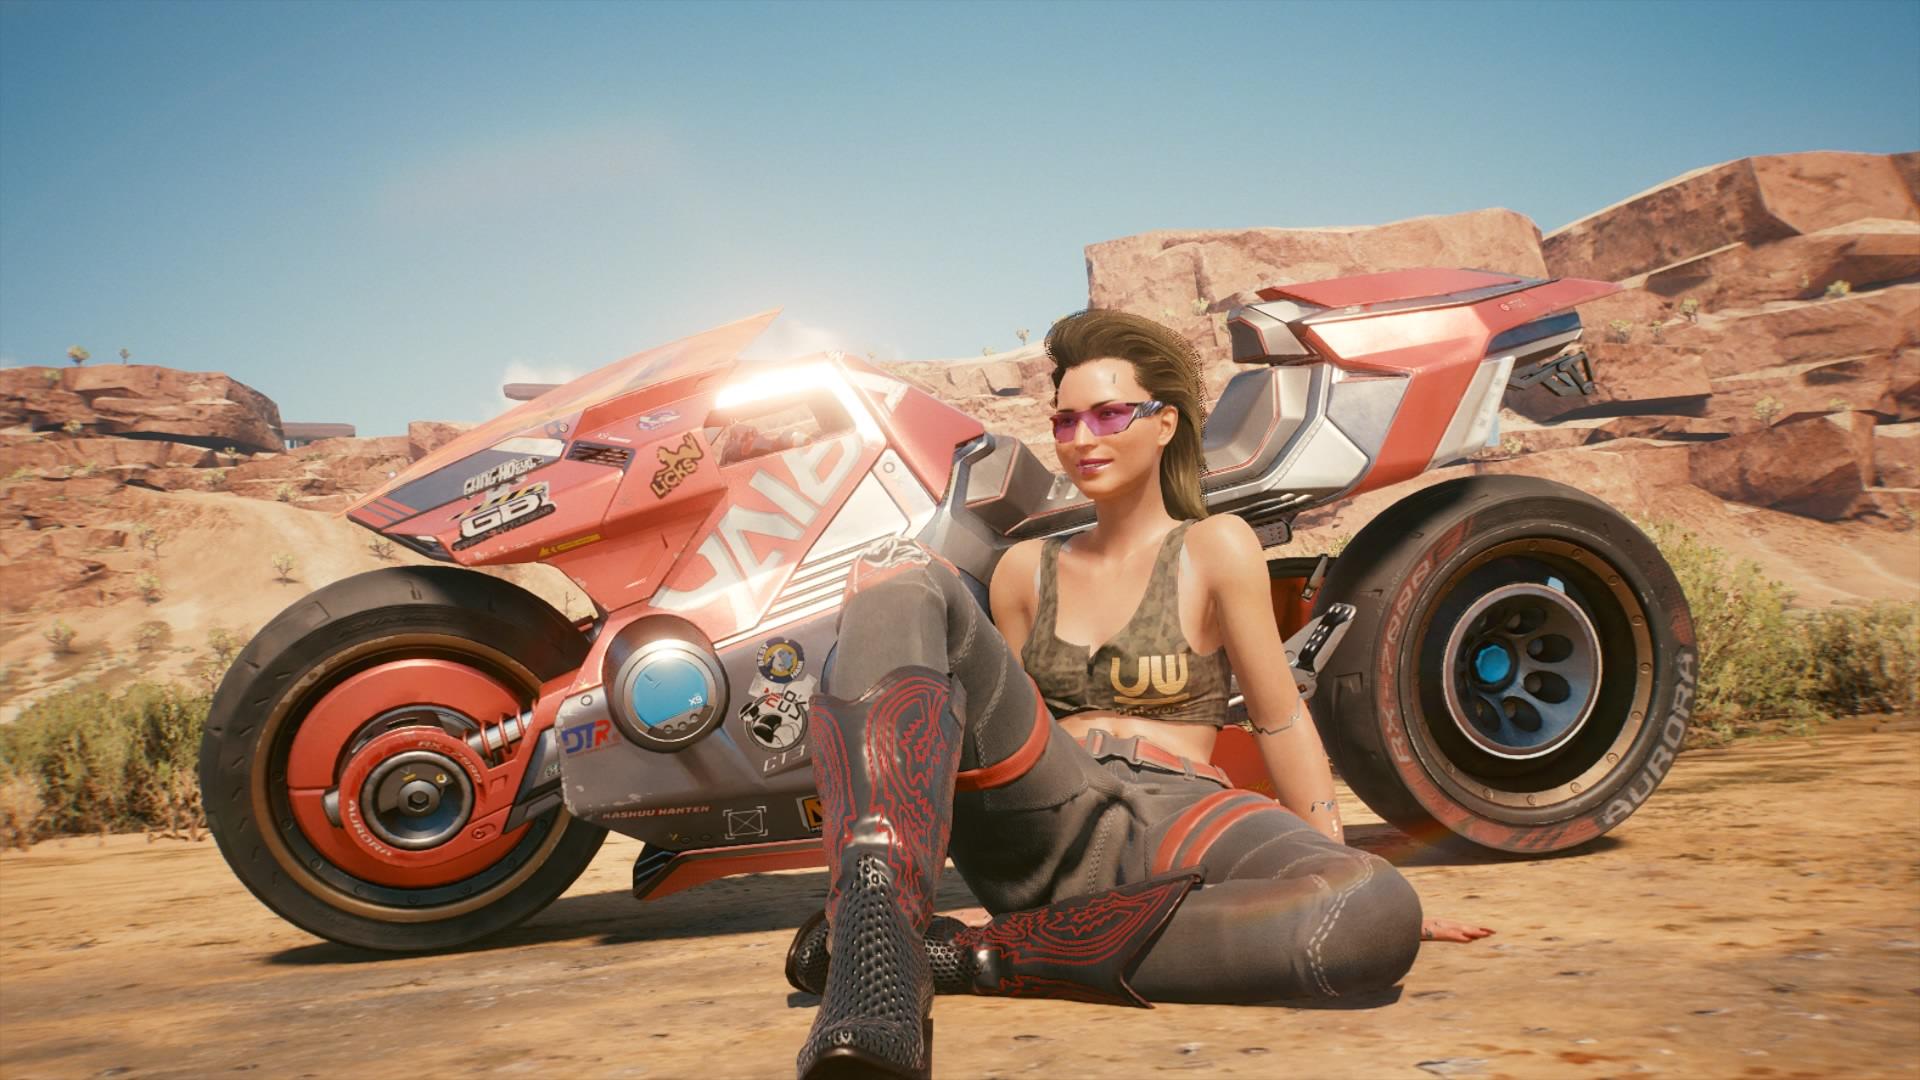 V_Corpo-Callie_Nomad-on-the-Road.jpg